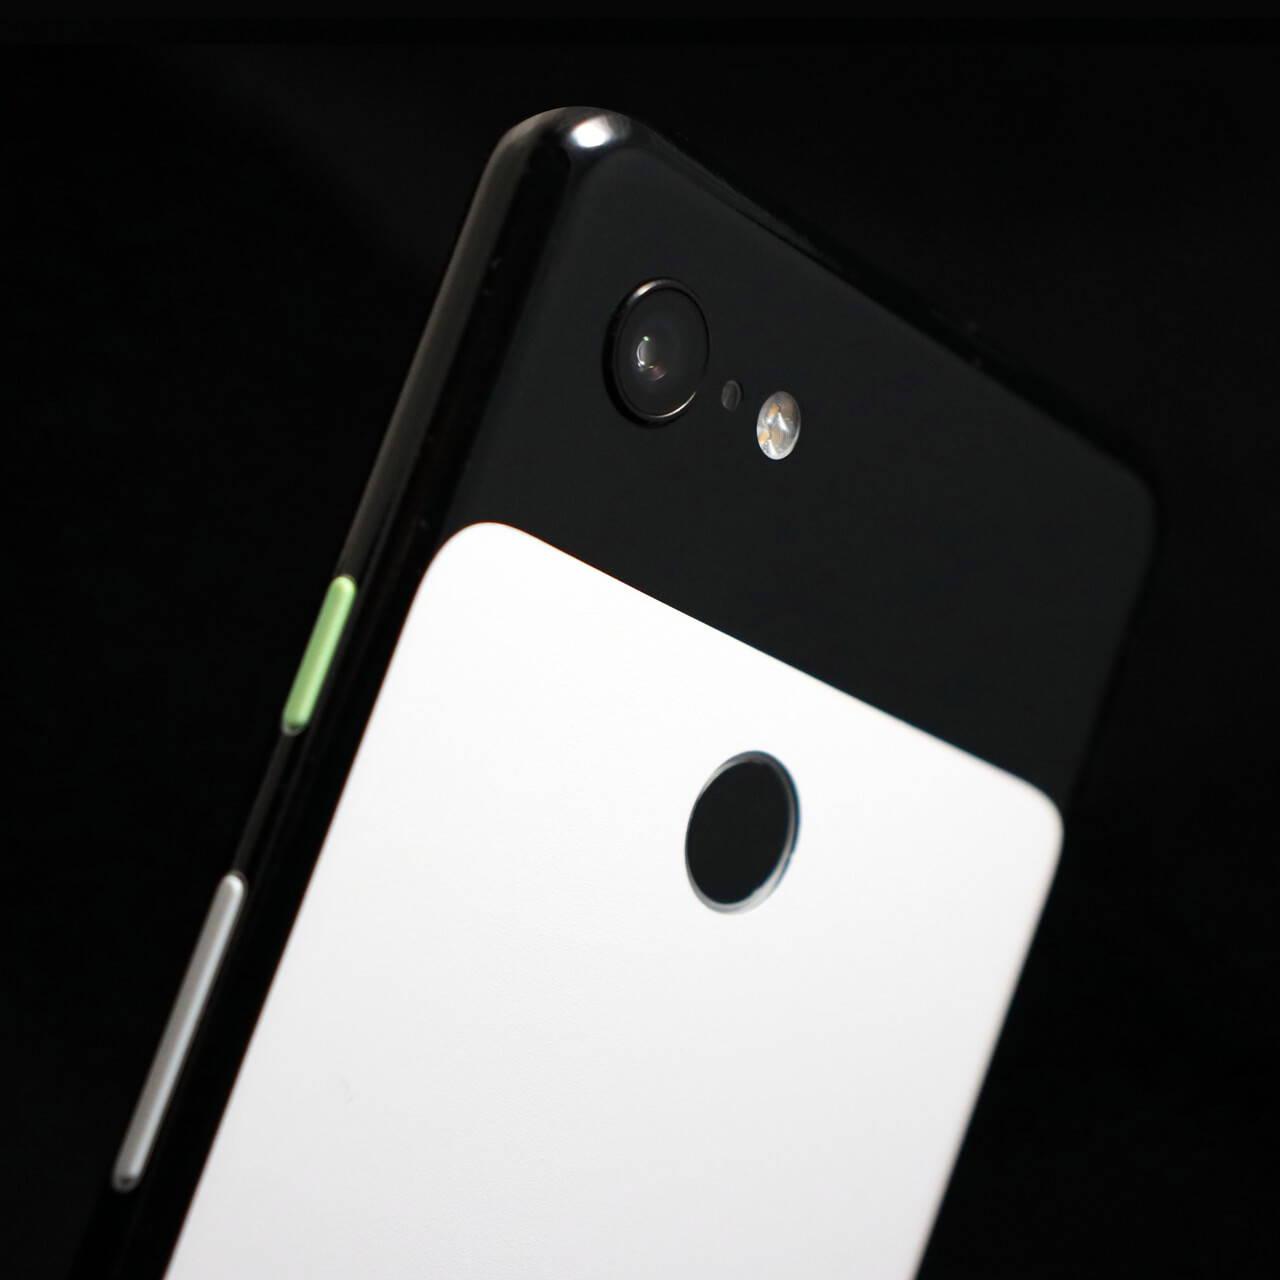 Google Pixel 3 XL Black Gloss and Matt White Skins